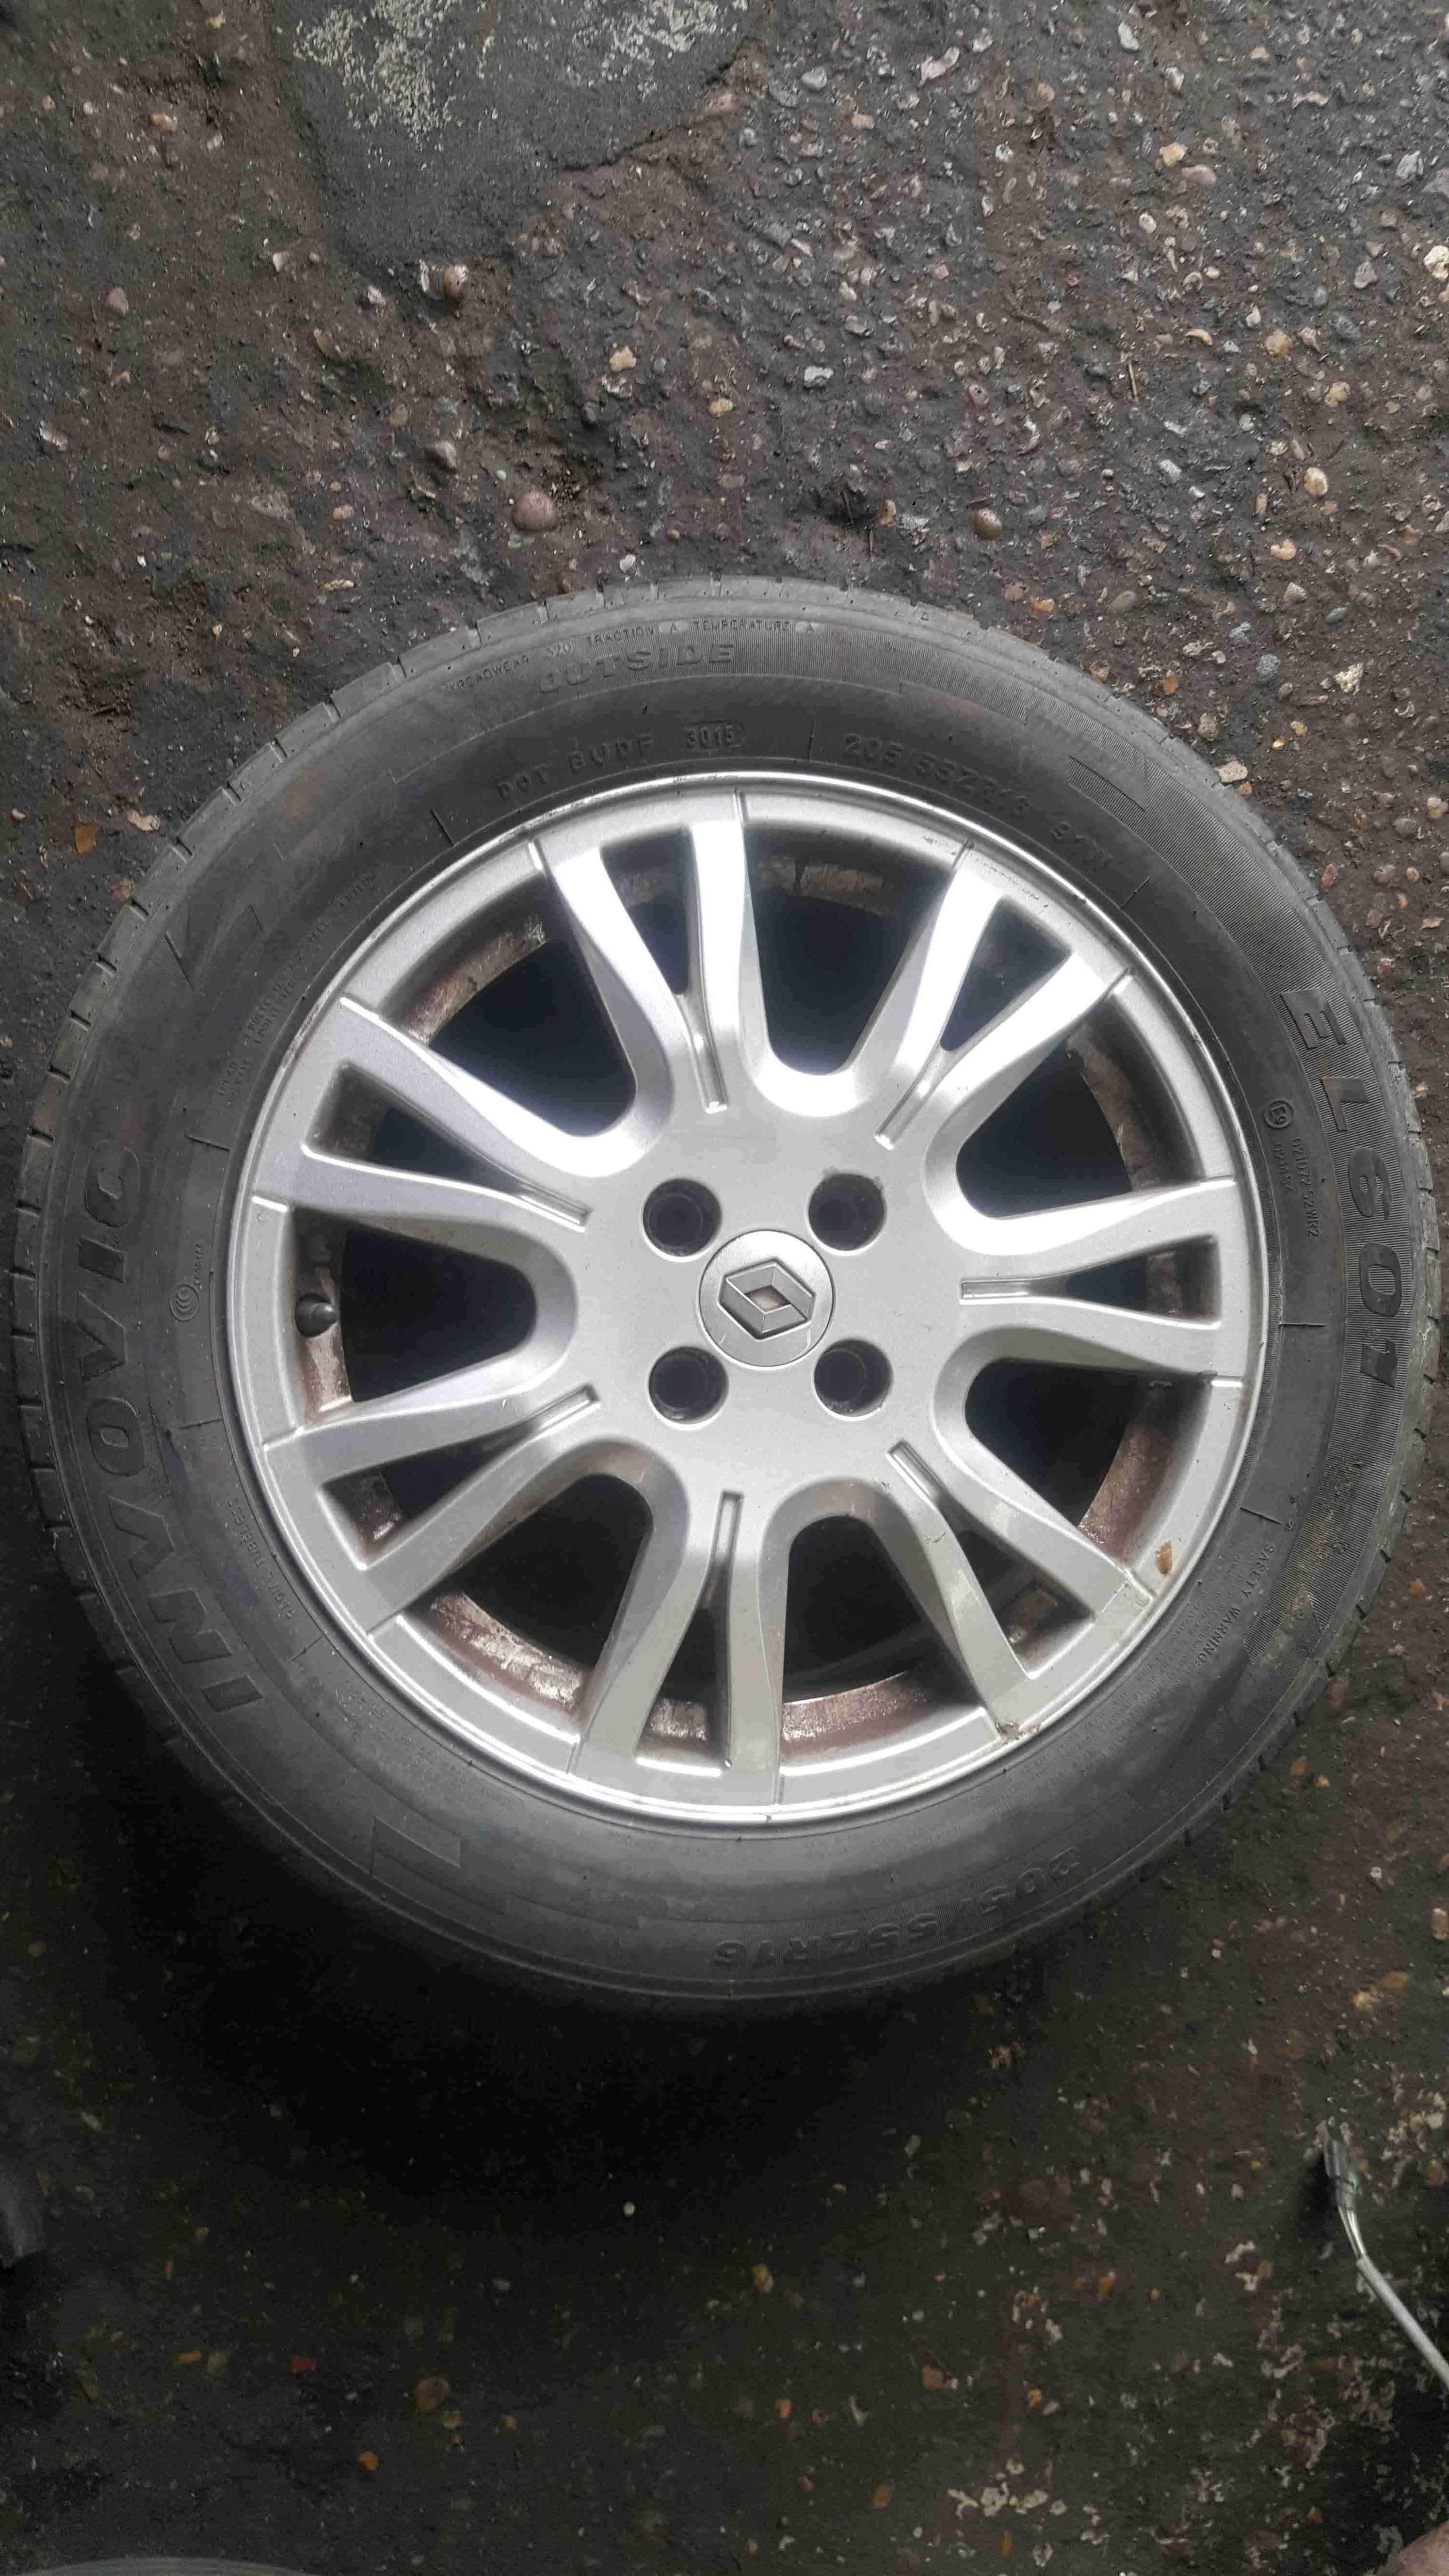 Renault Megane 2002-2008 Ozedia Alloy Wheel 16inch